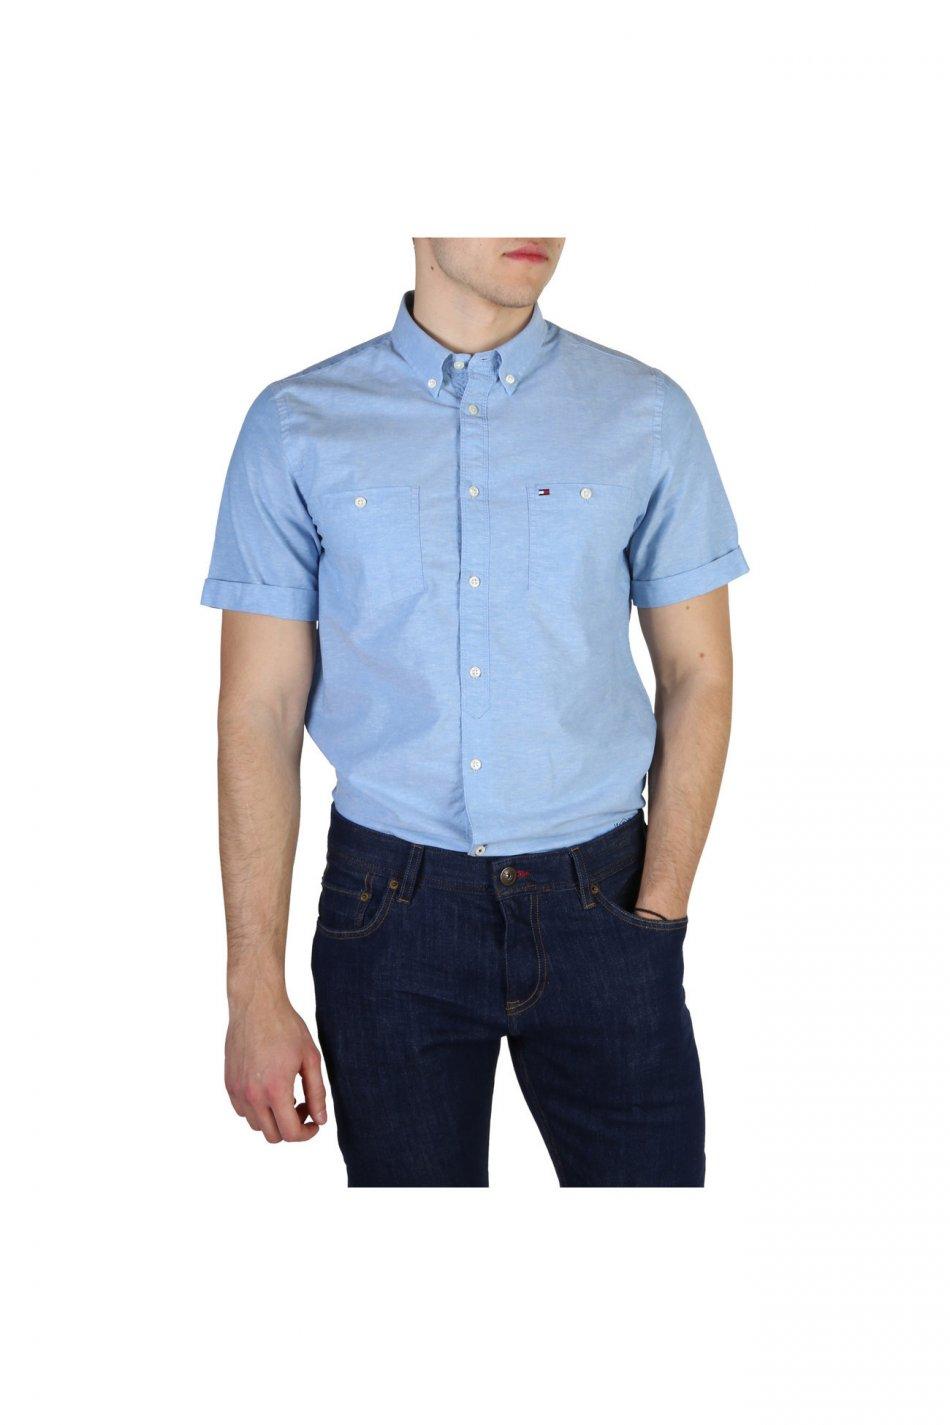 Camasa barbati Tommy Hilfiger model MW0MW01960, culoare Albastru, marime L EU